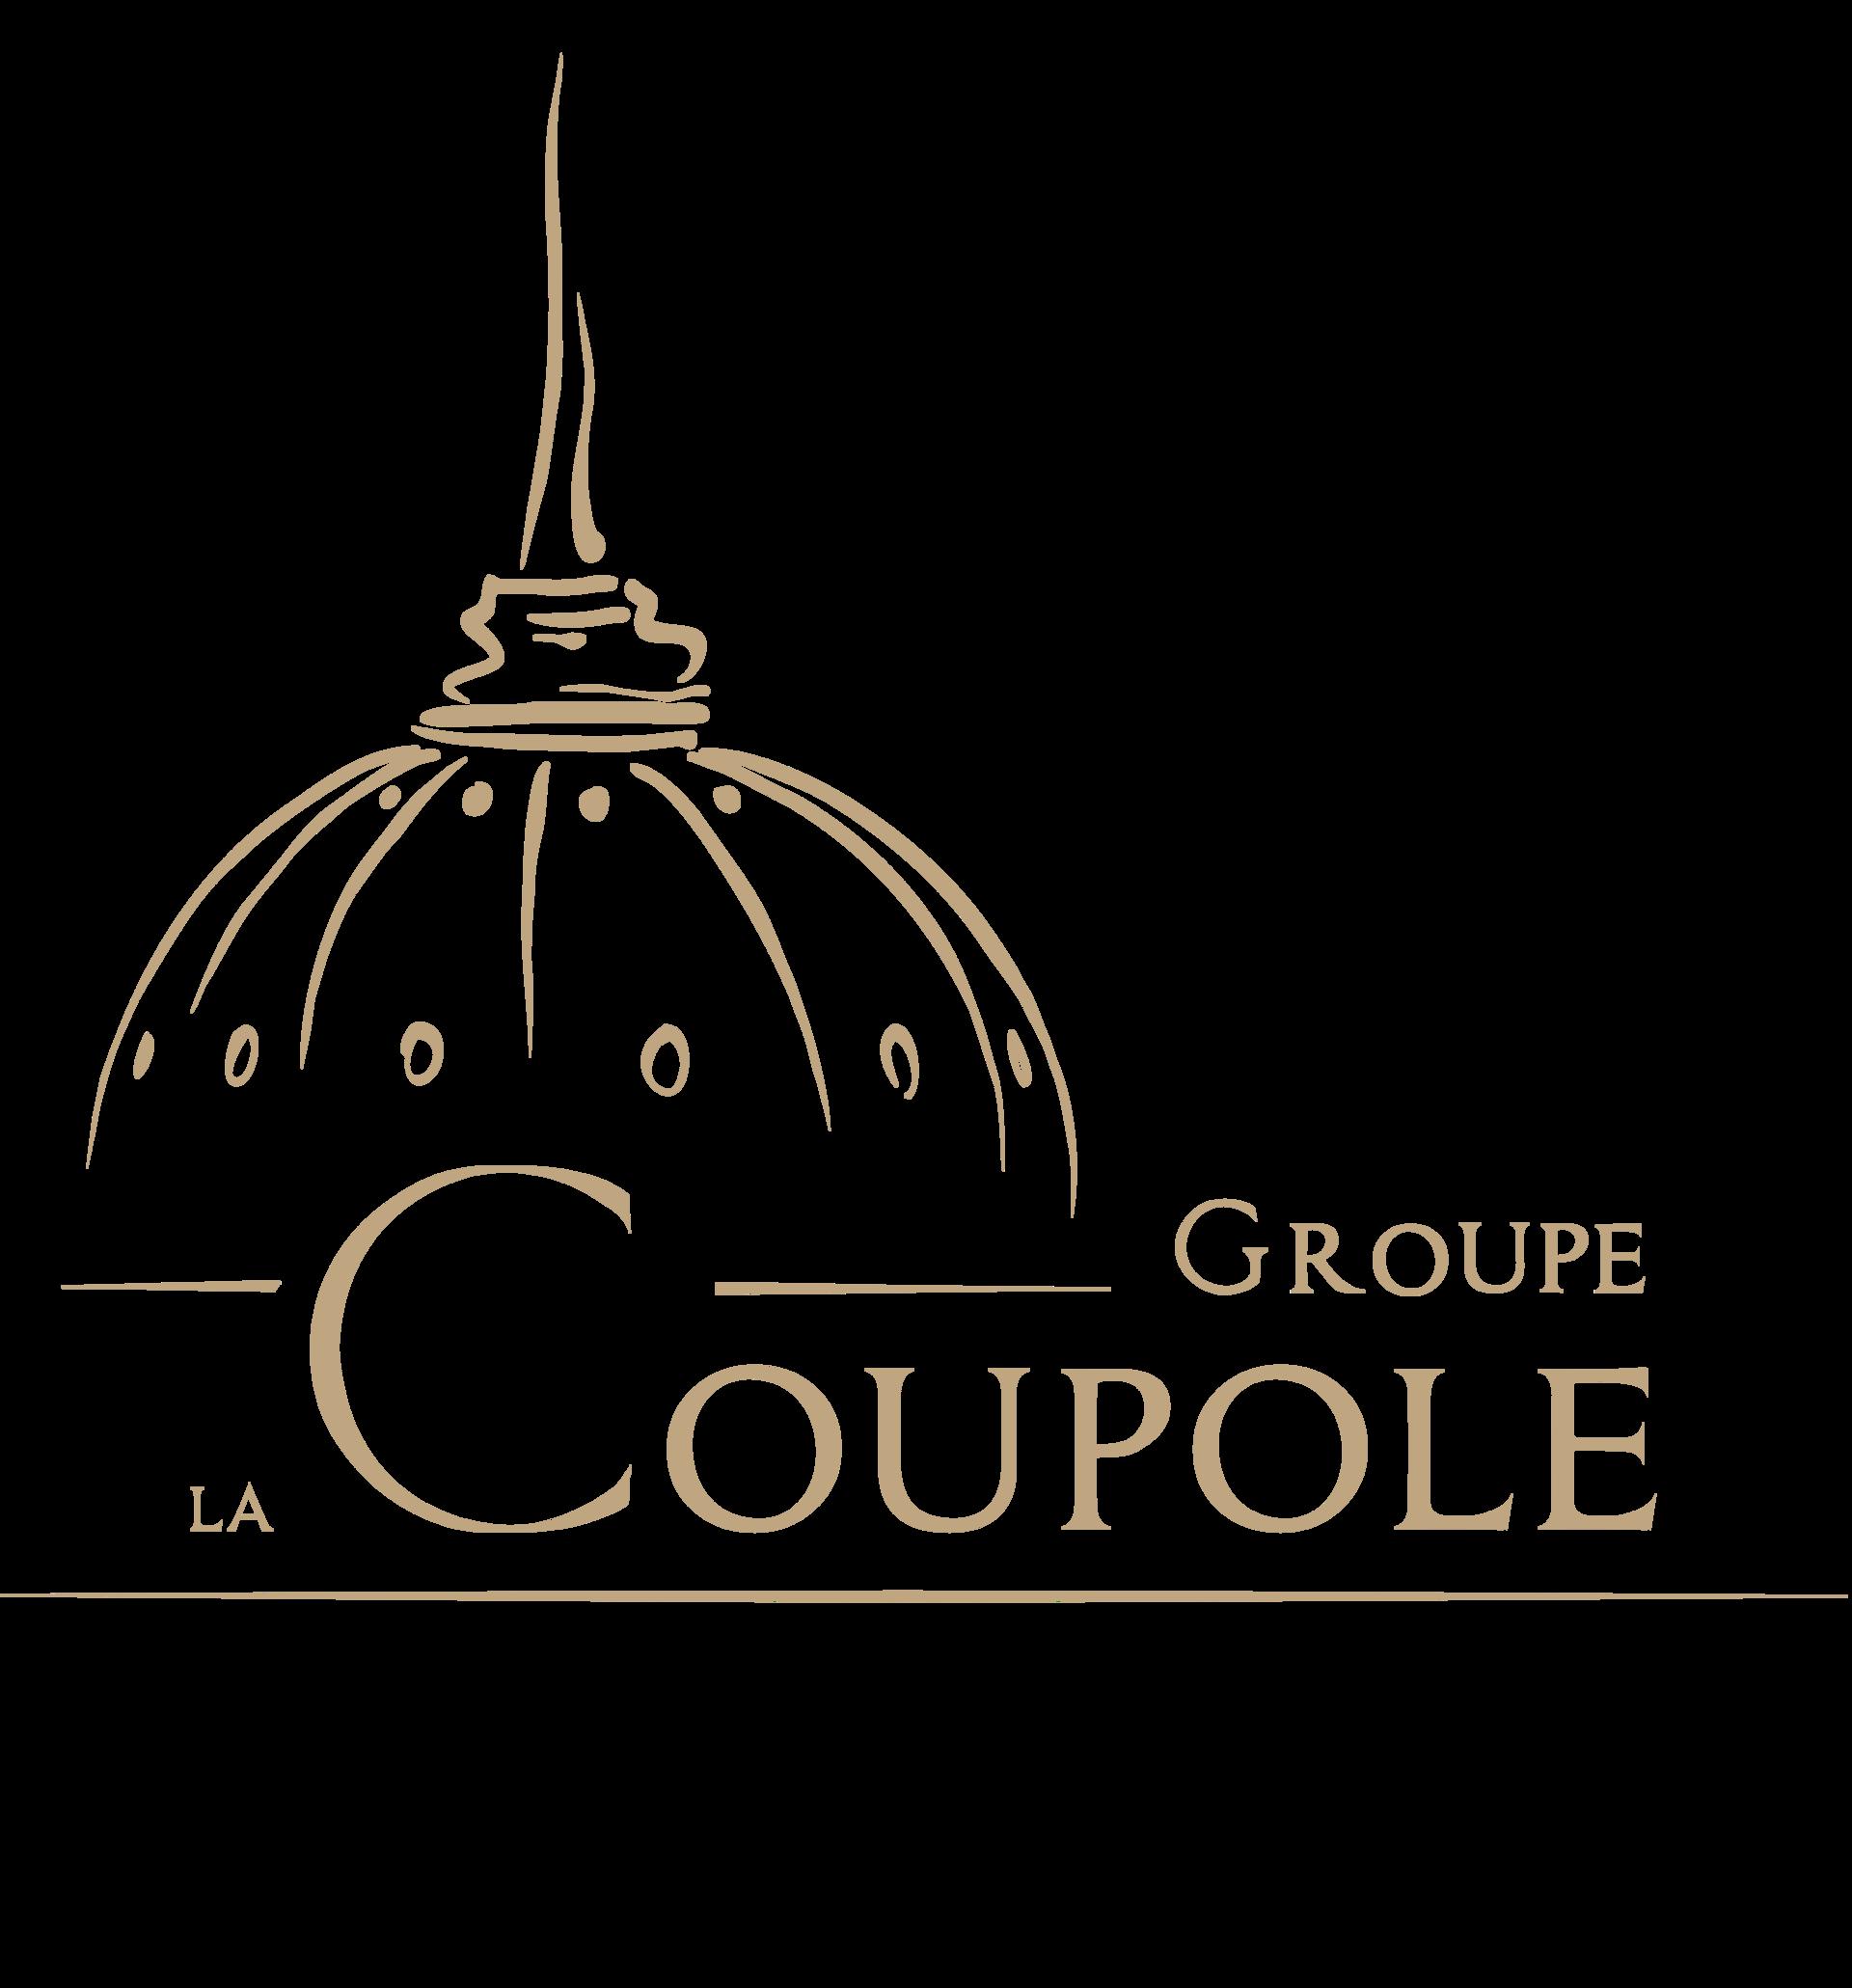 Groupe La Coupole